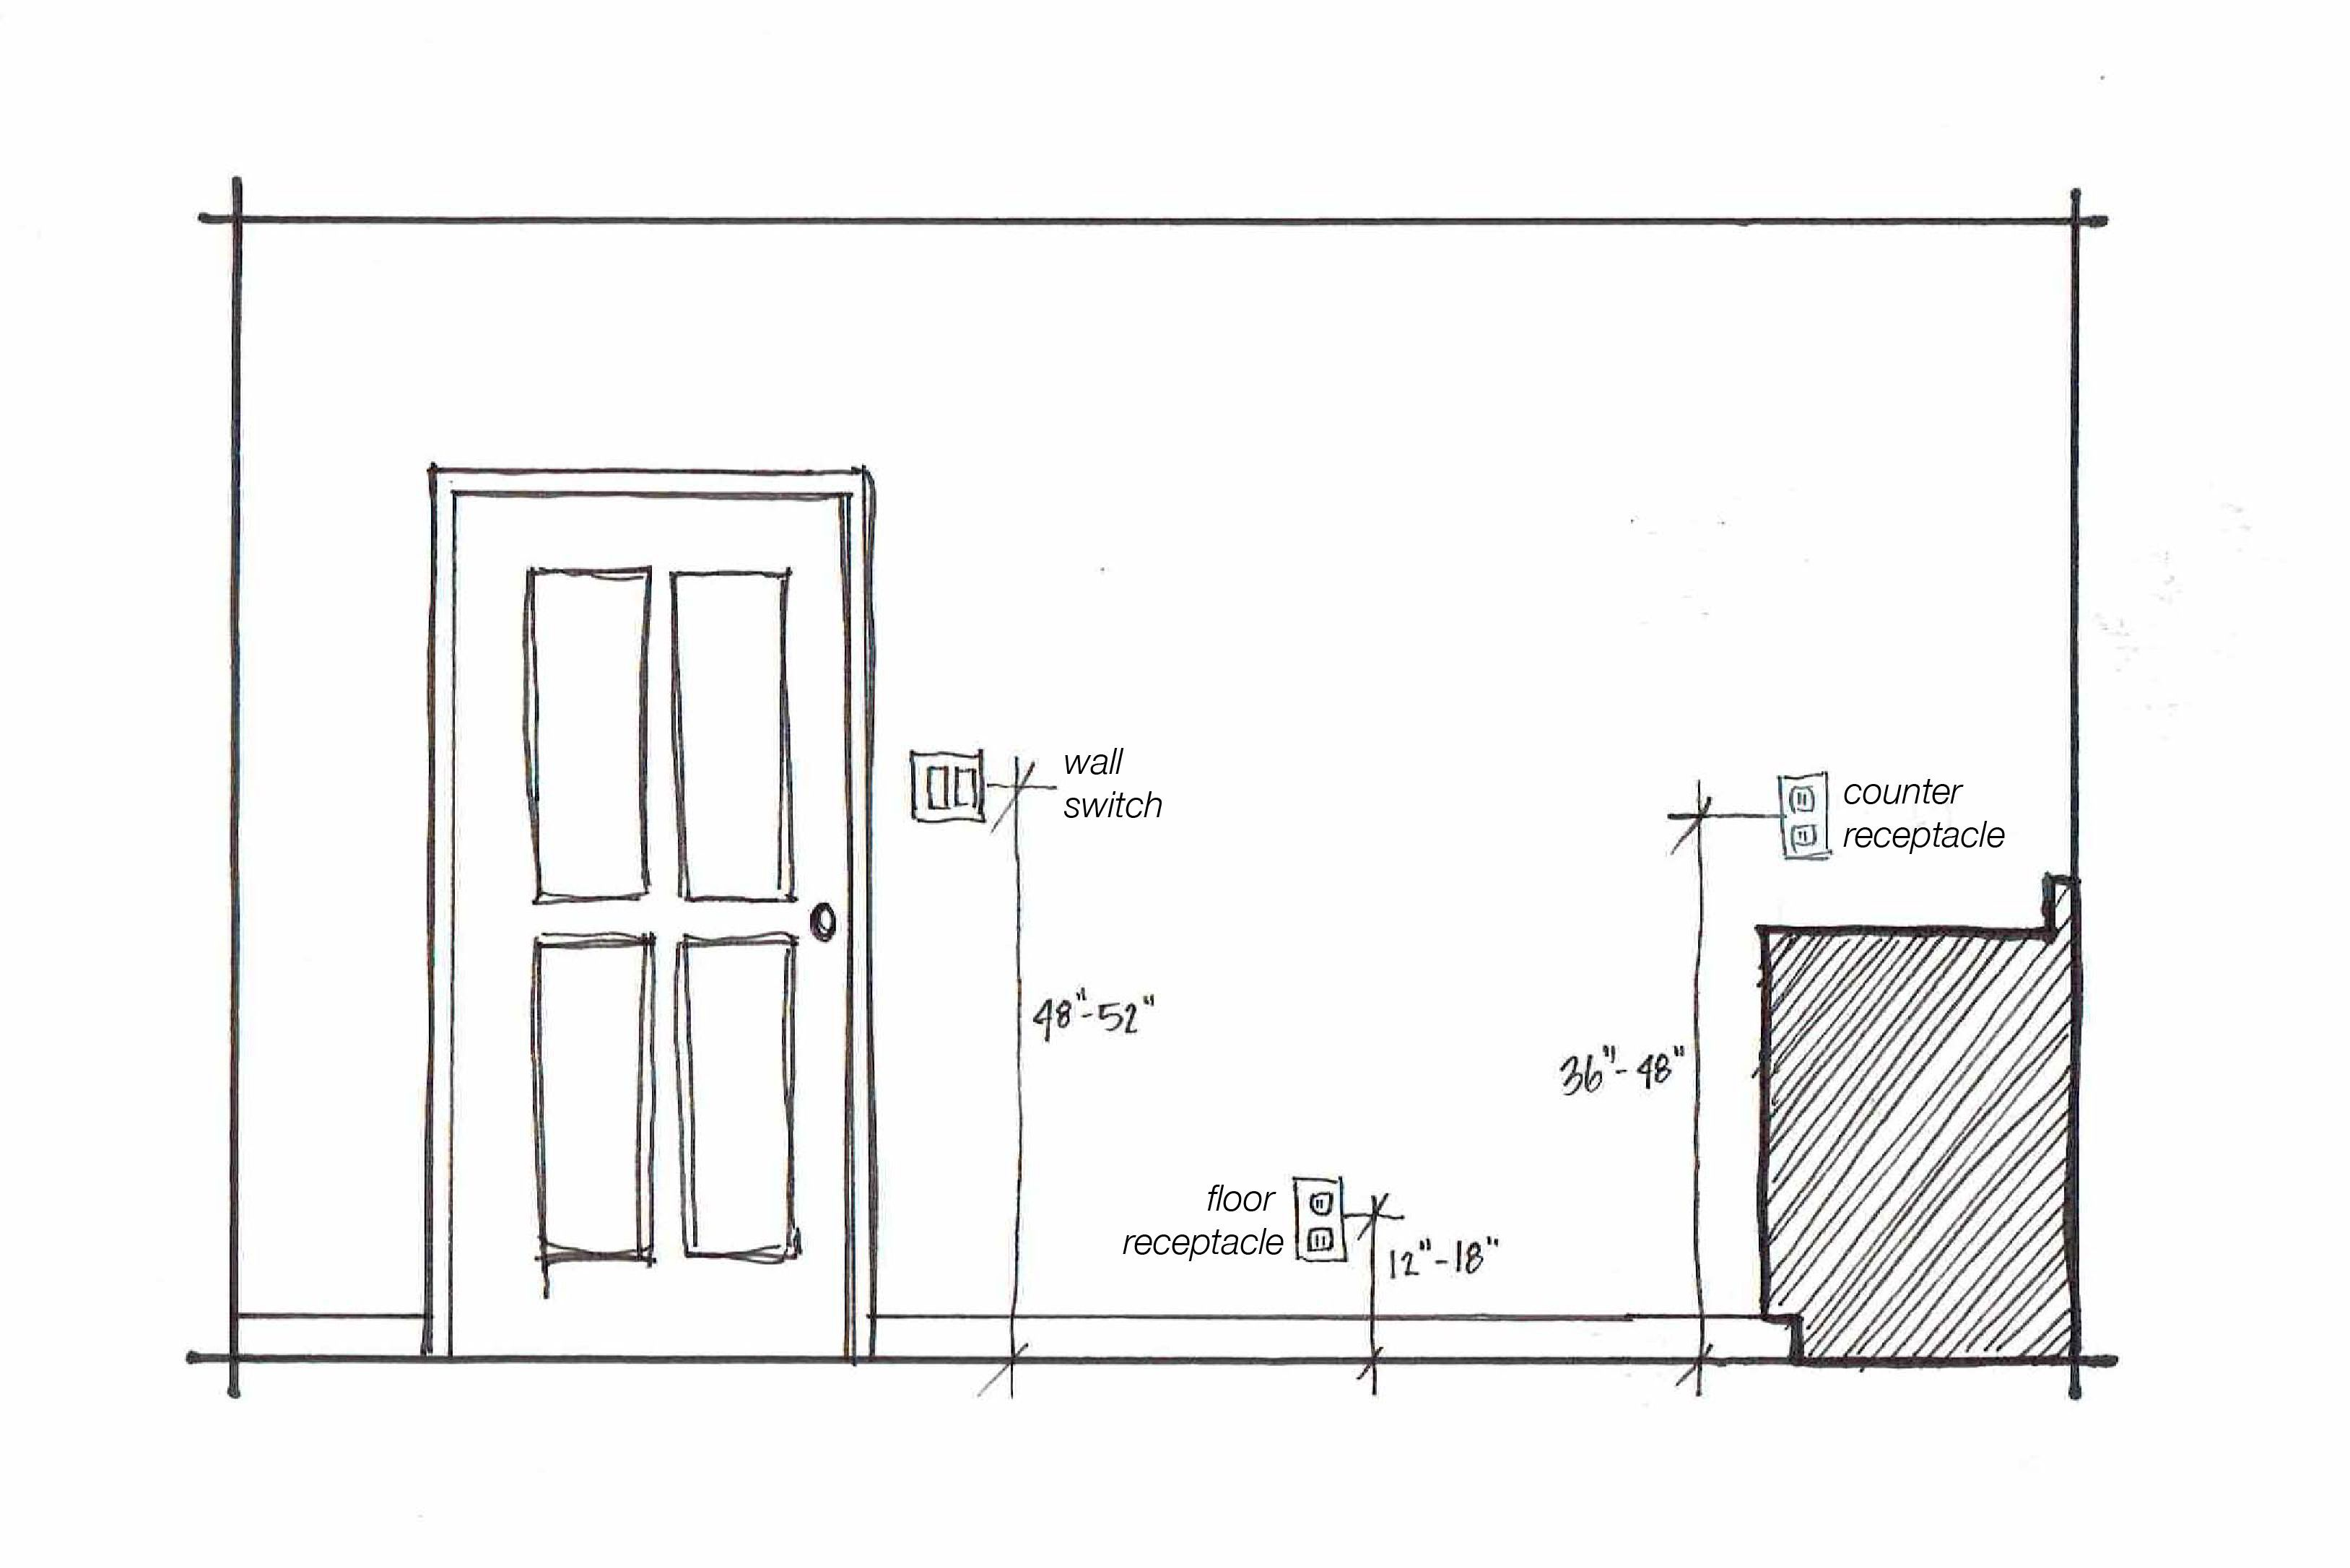 kitchen wiring layout uk